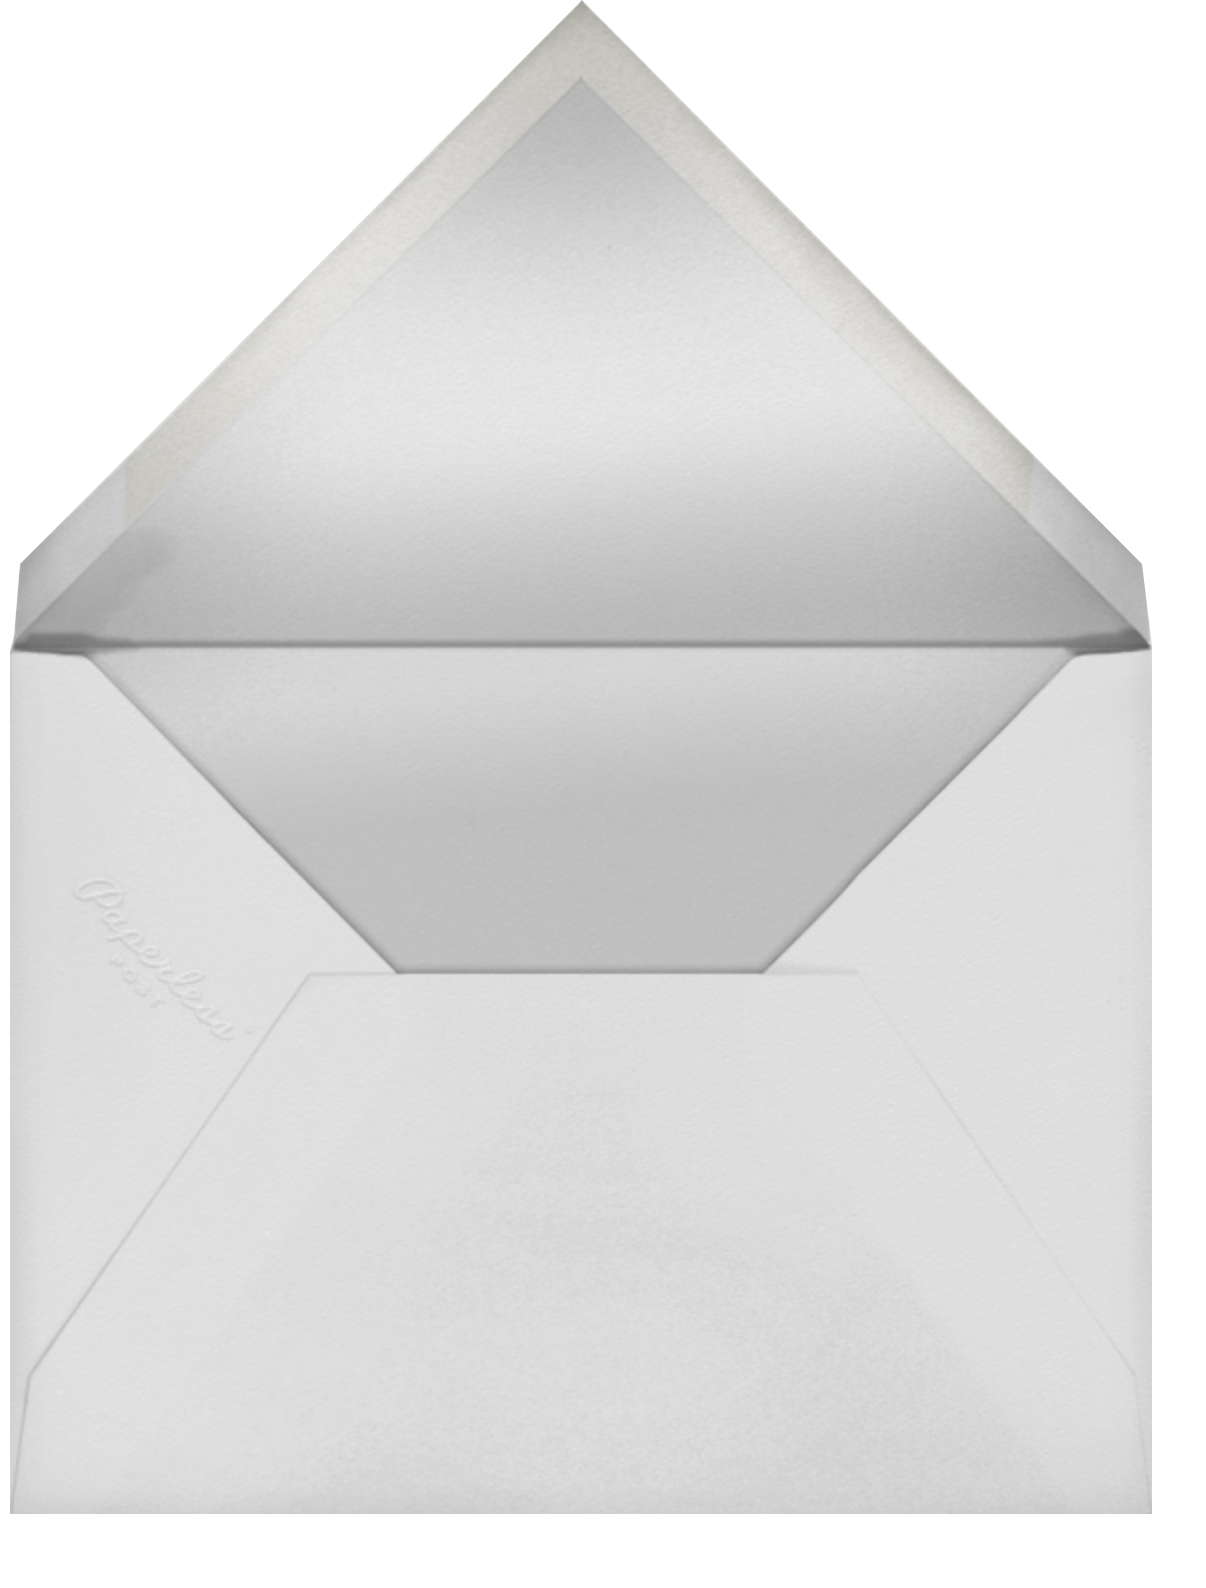 London Skyline View (Menu) - Black/White - Paperless Post - Menus - envelope back